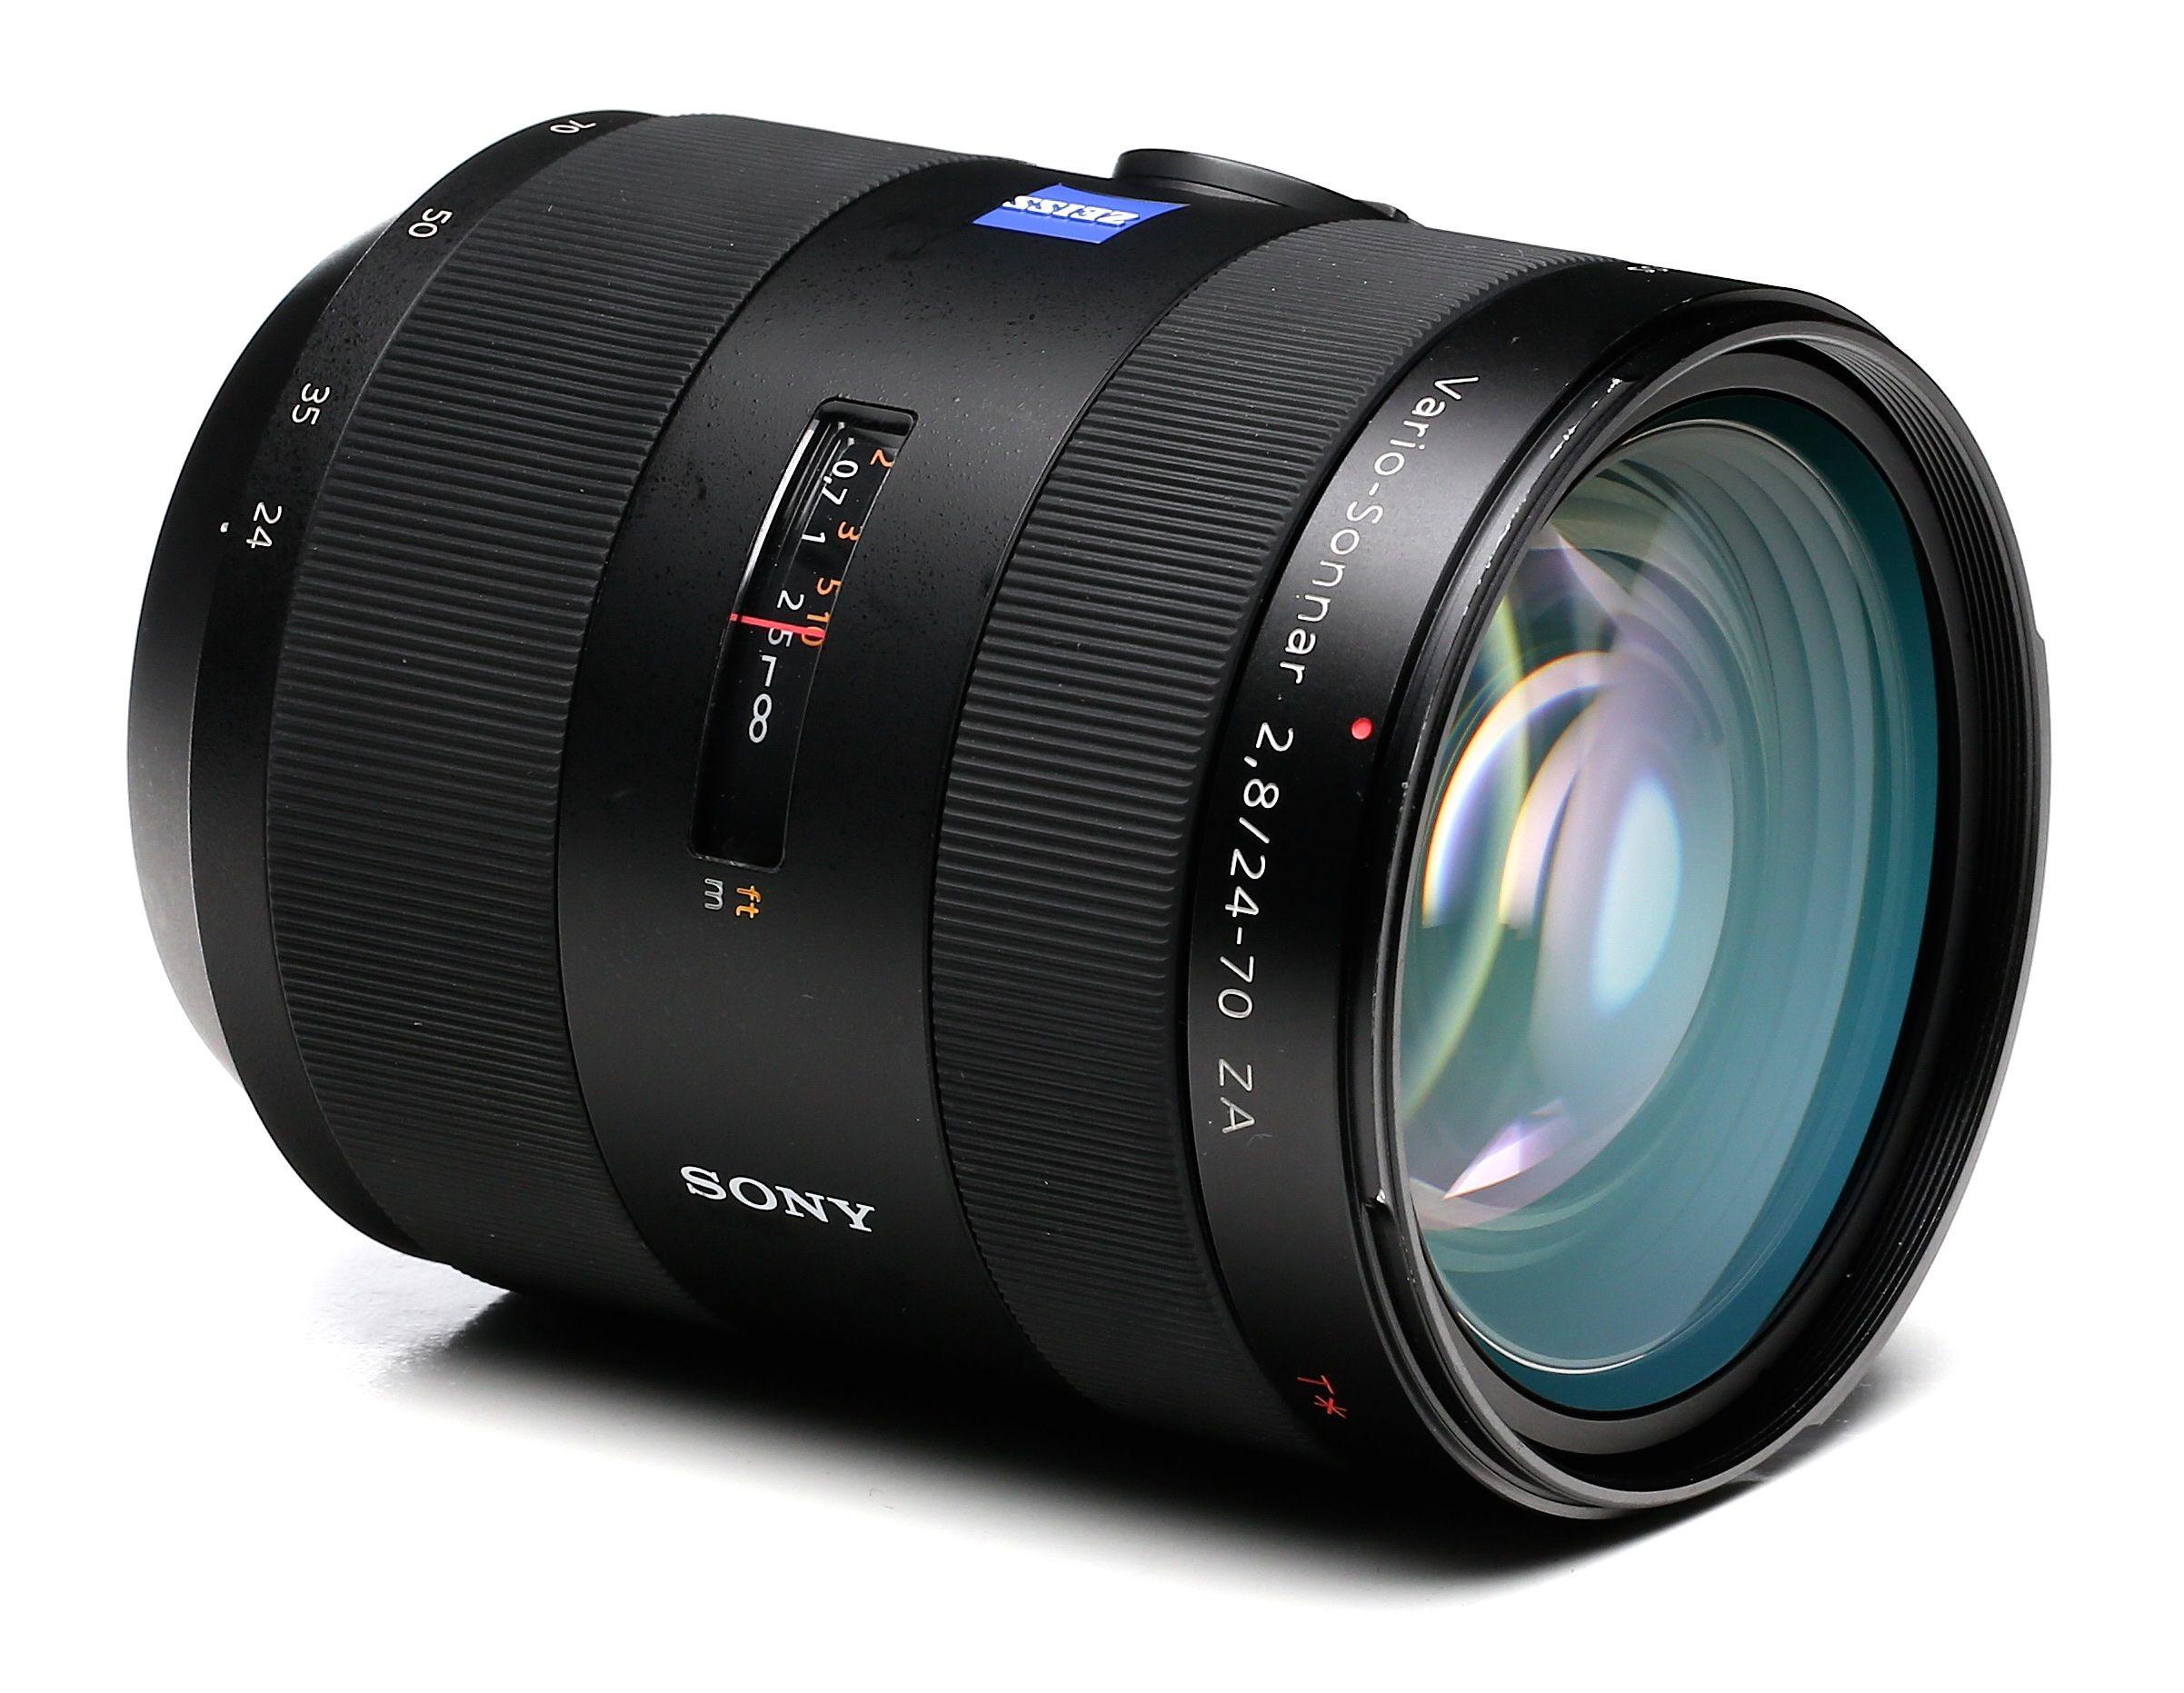 Sony zeiss alpha a mount 24 70mm f 2.8